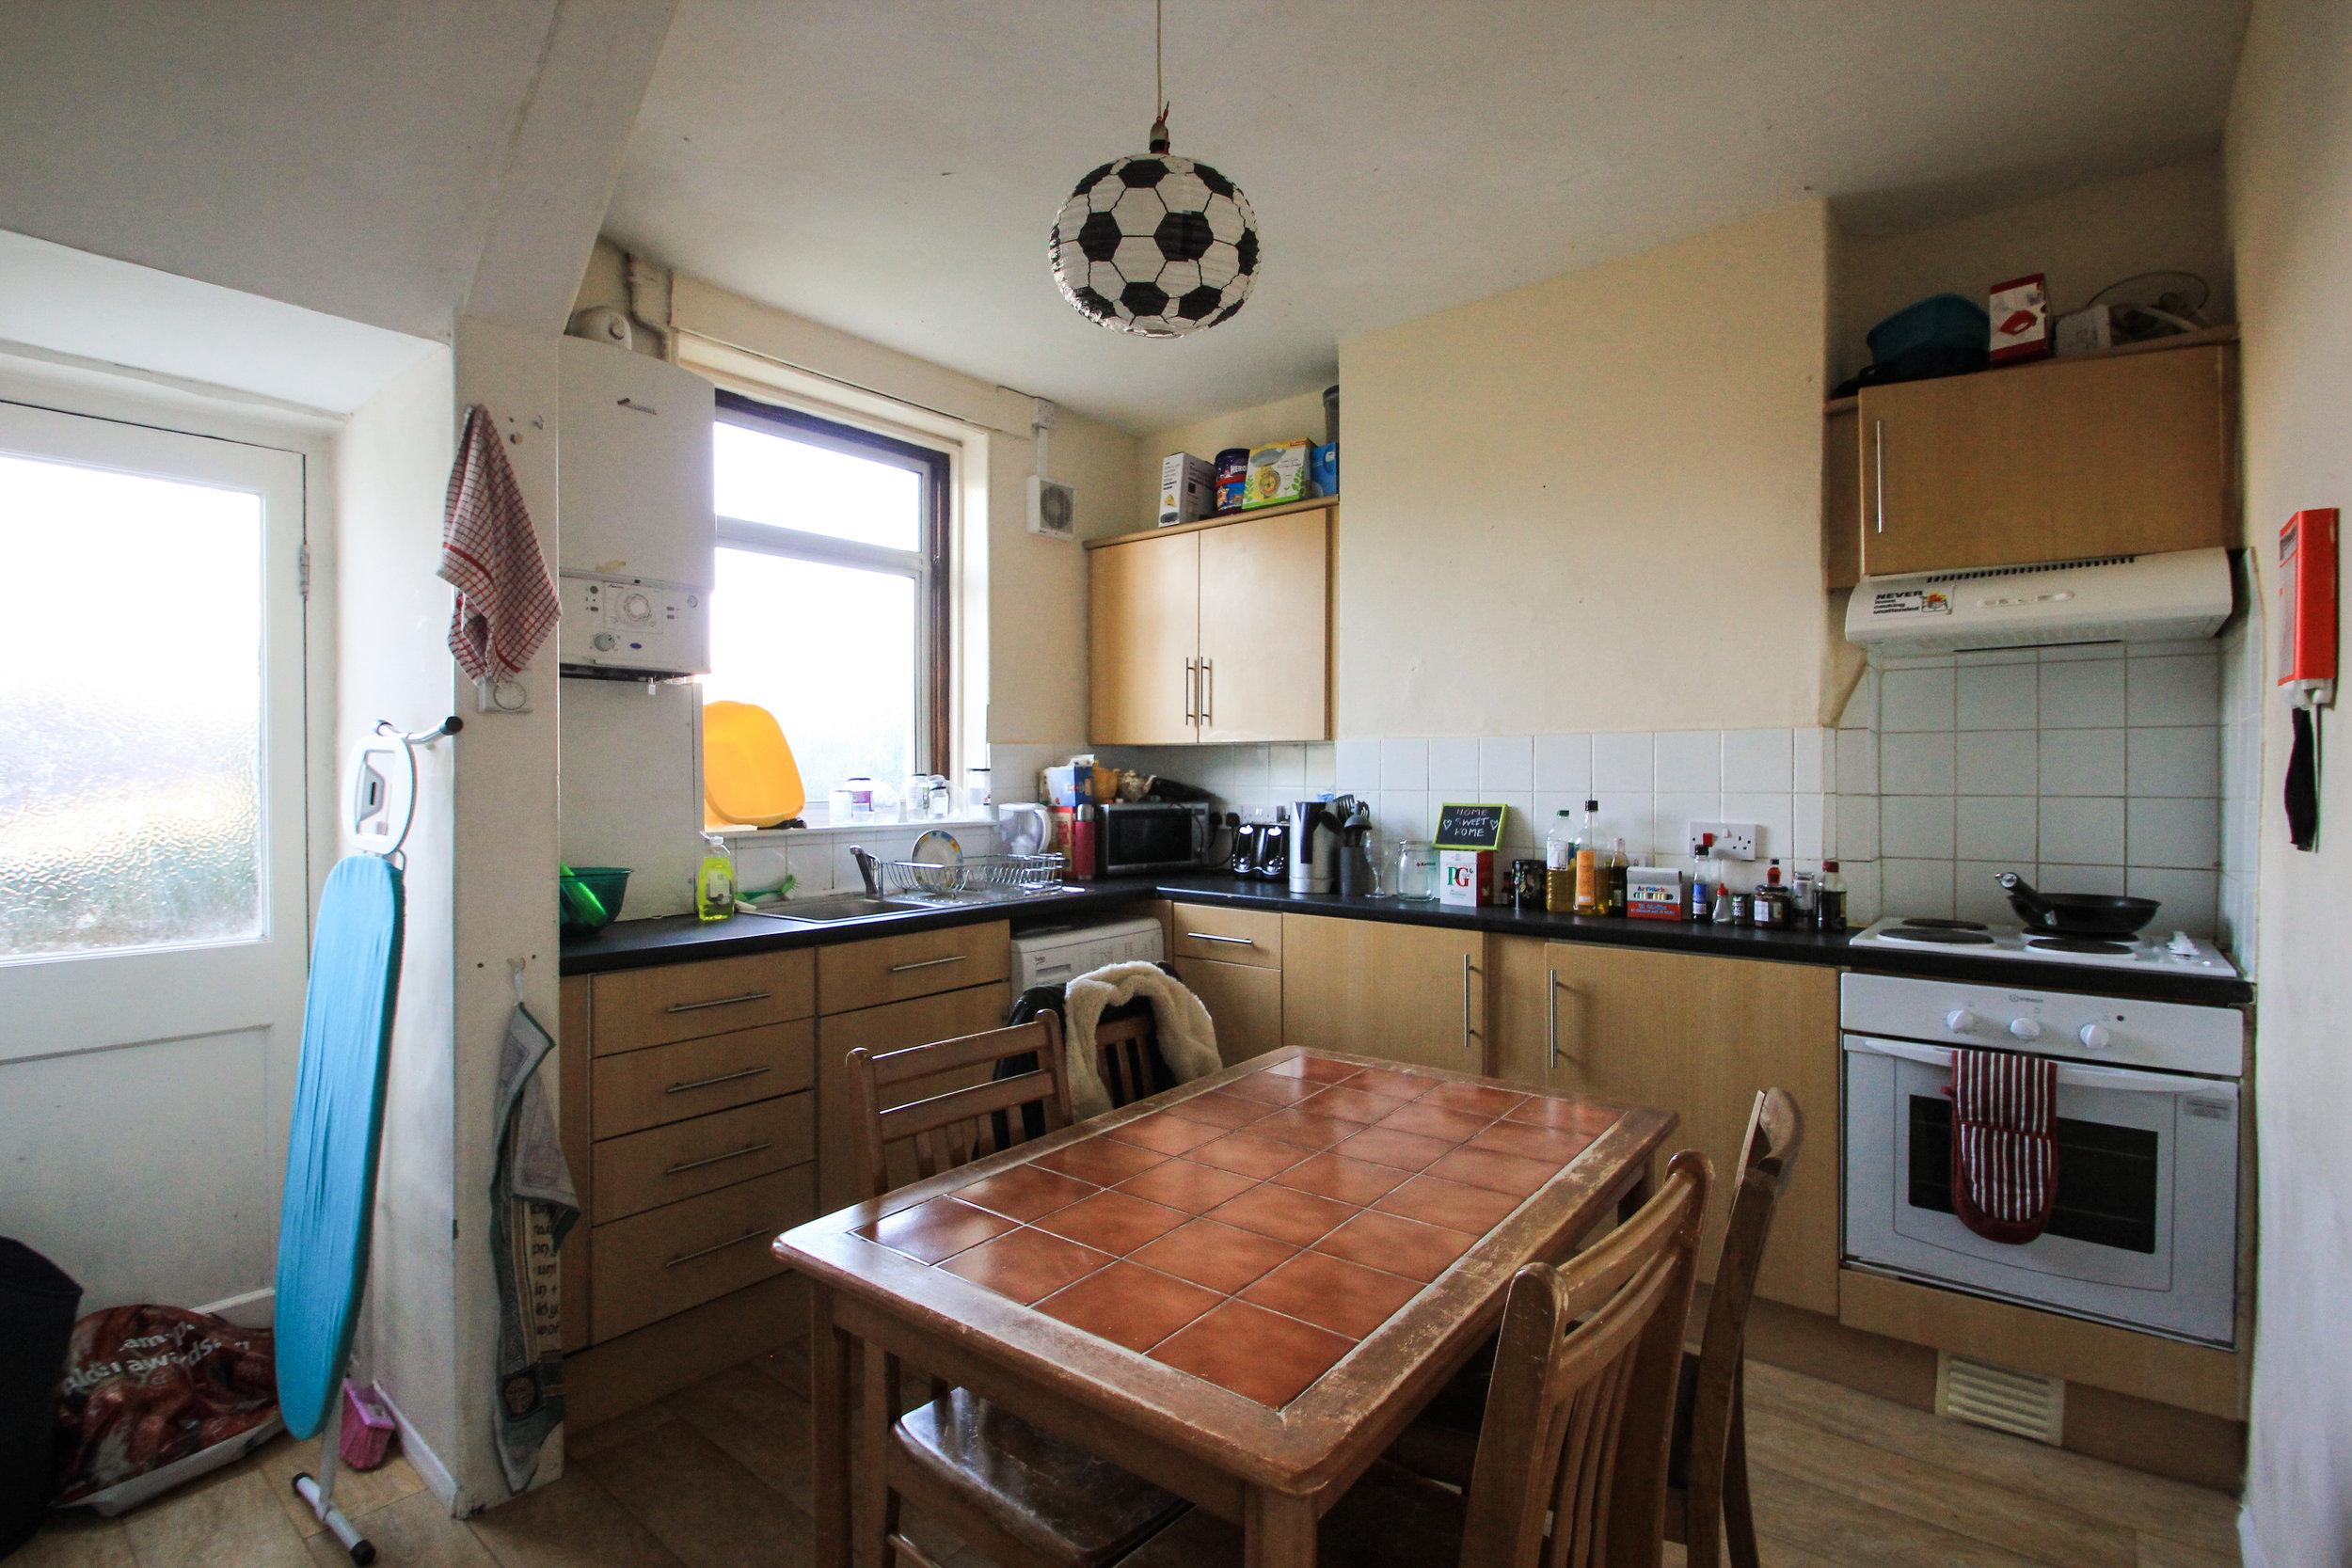 IMG_8975_edited.jpg kitchen .jpg